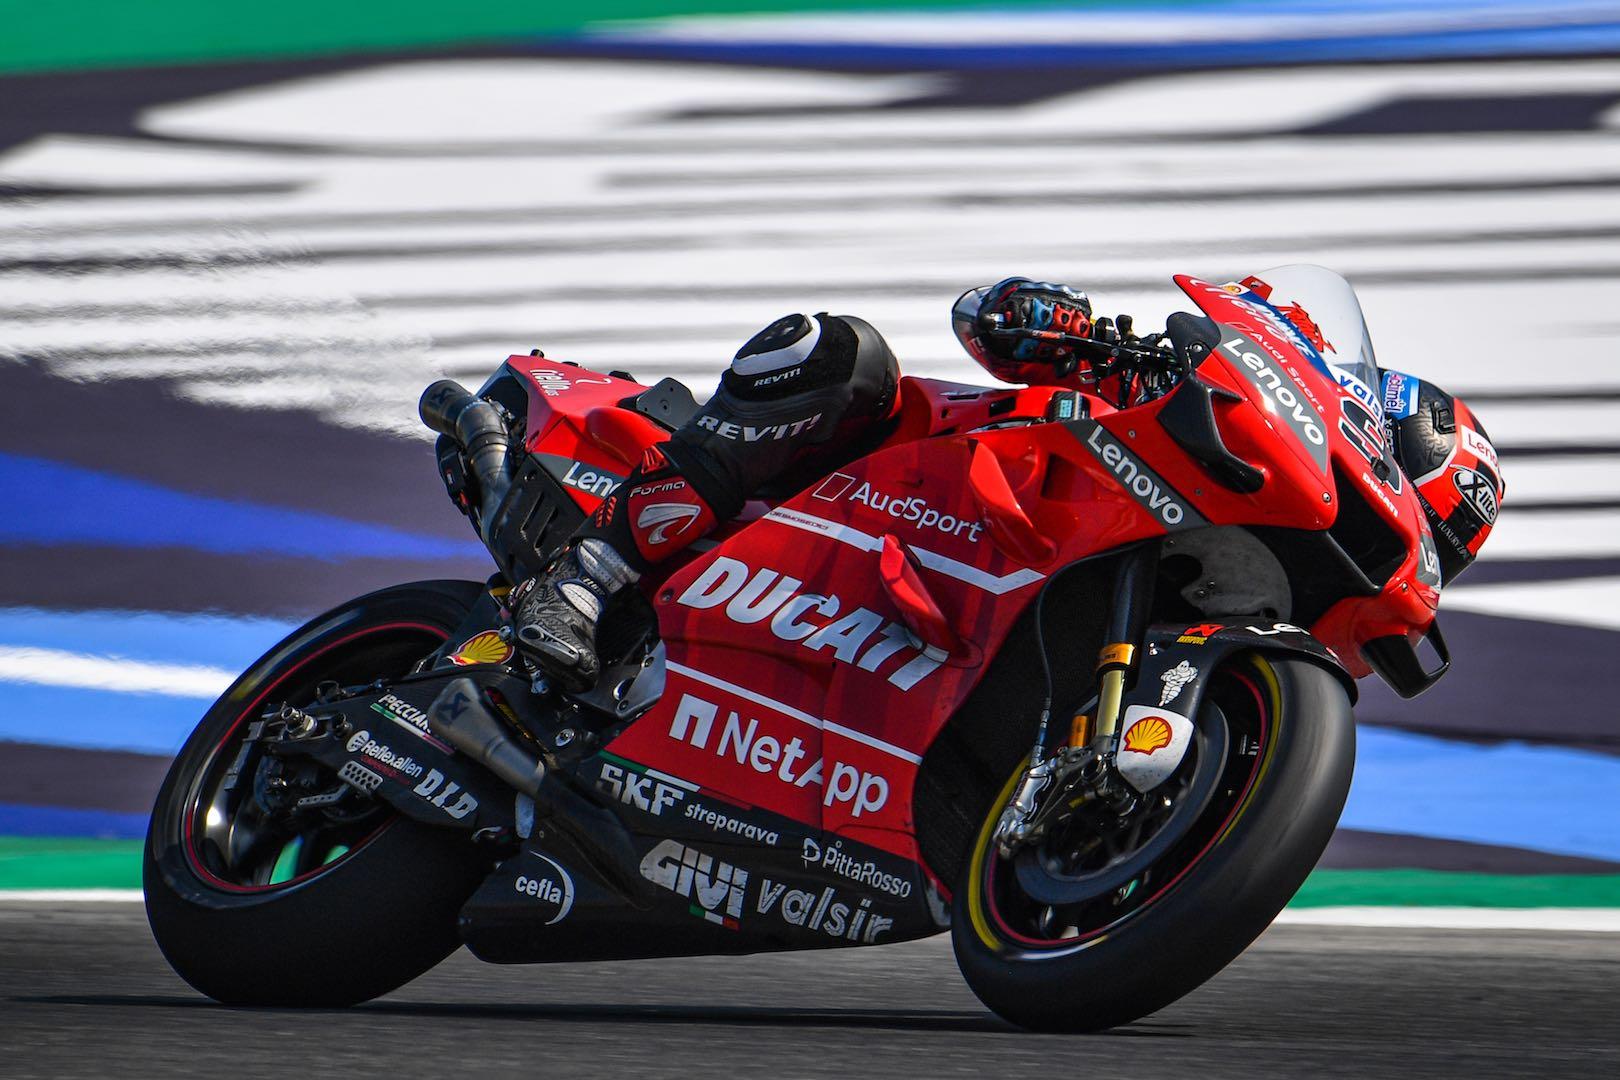 Yamaha's Quartararo Dominates 2-Day Misano MotoGP Test Ducati Petrucci